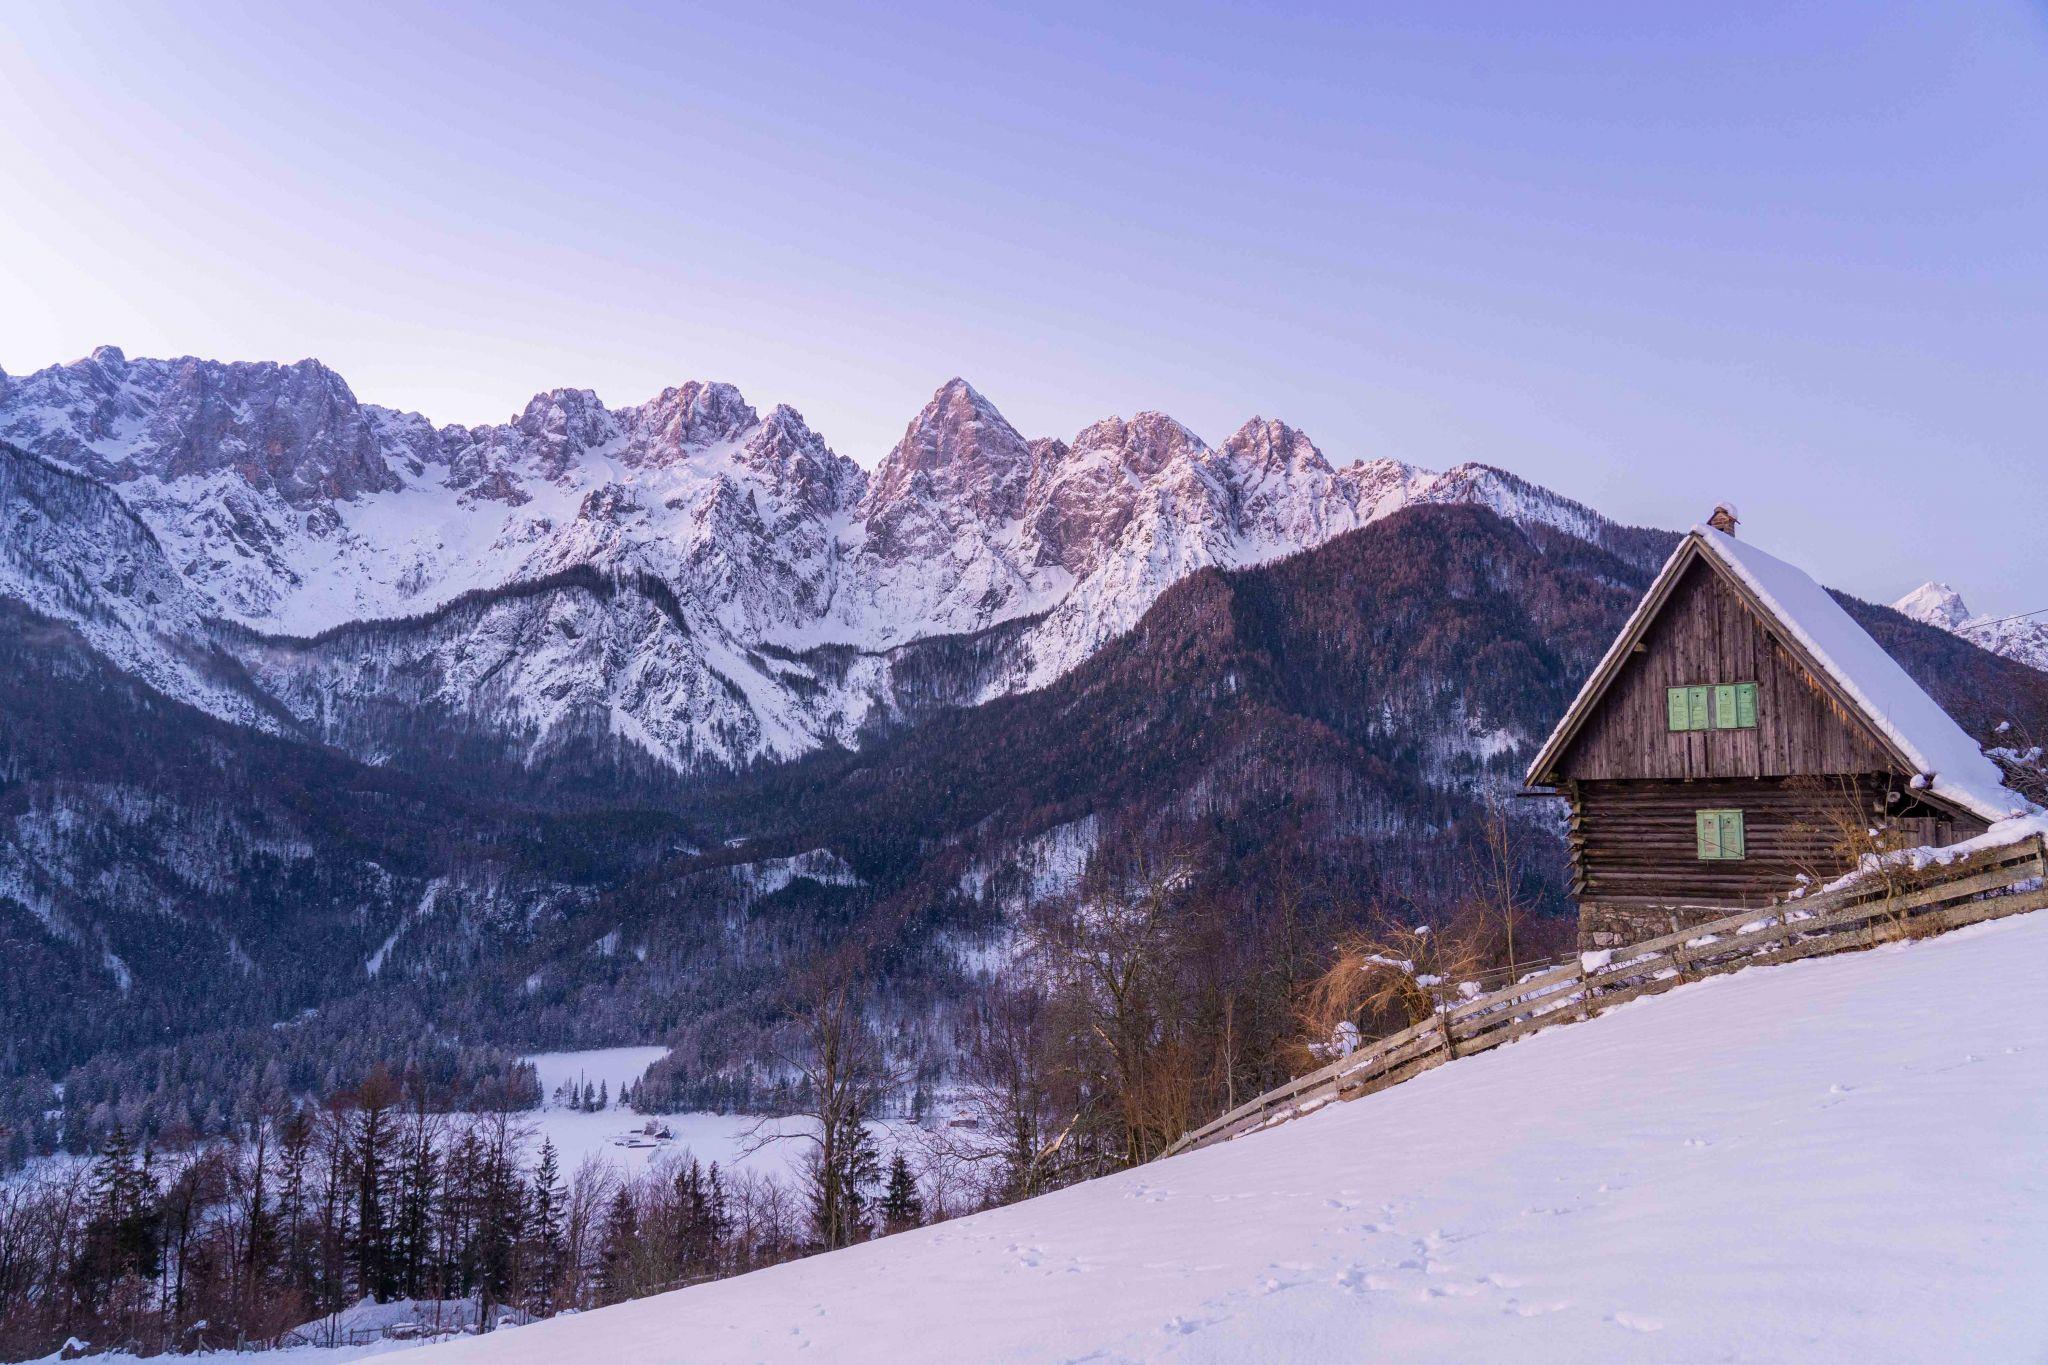 Špik mountain range from Srednji Vrh, Slovenia